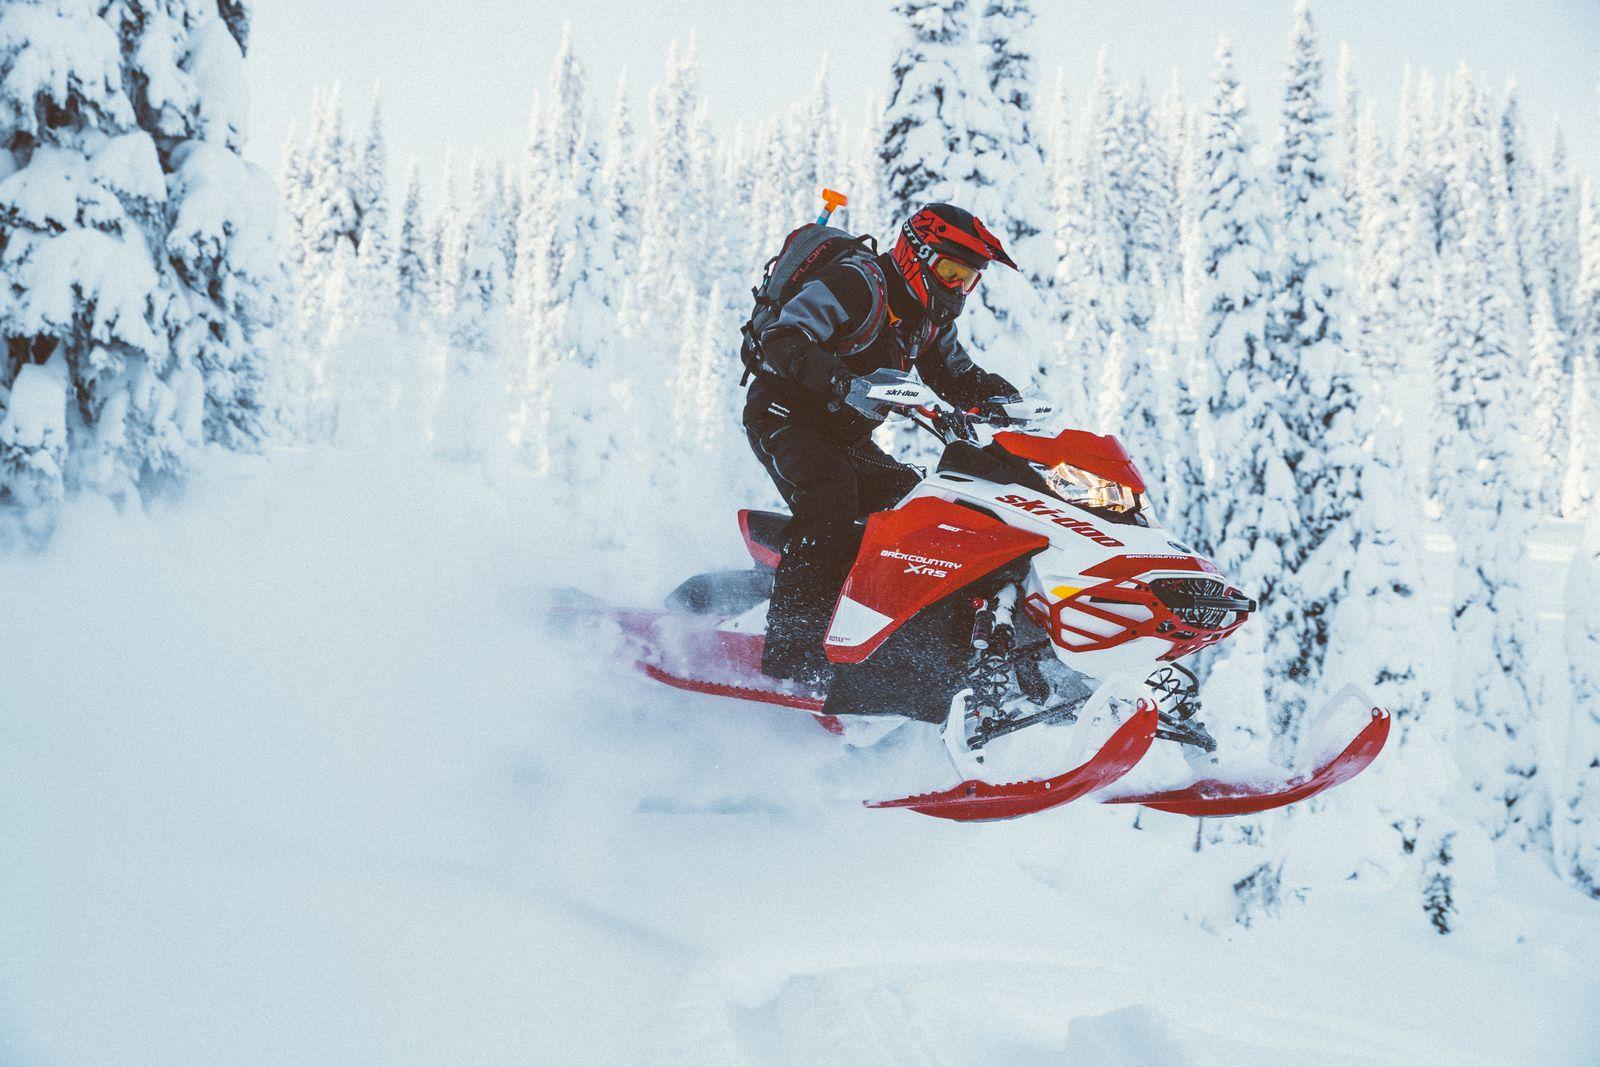 Ski-Doo® X-RS jumping snow berm